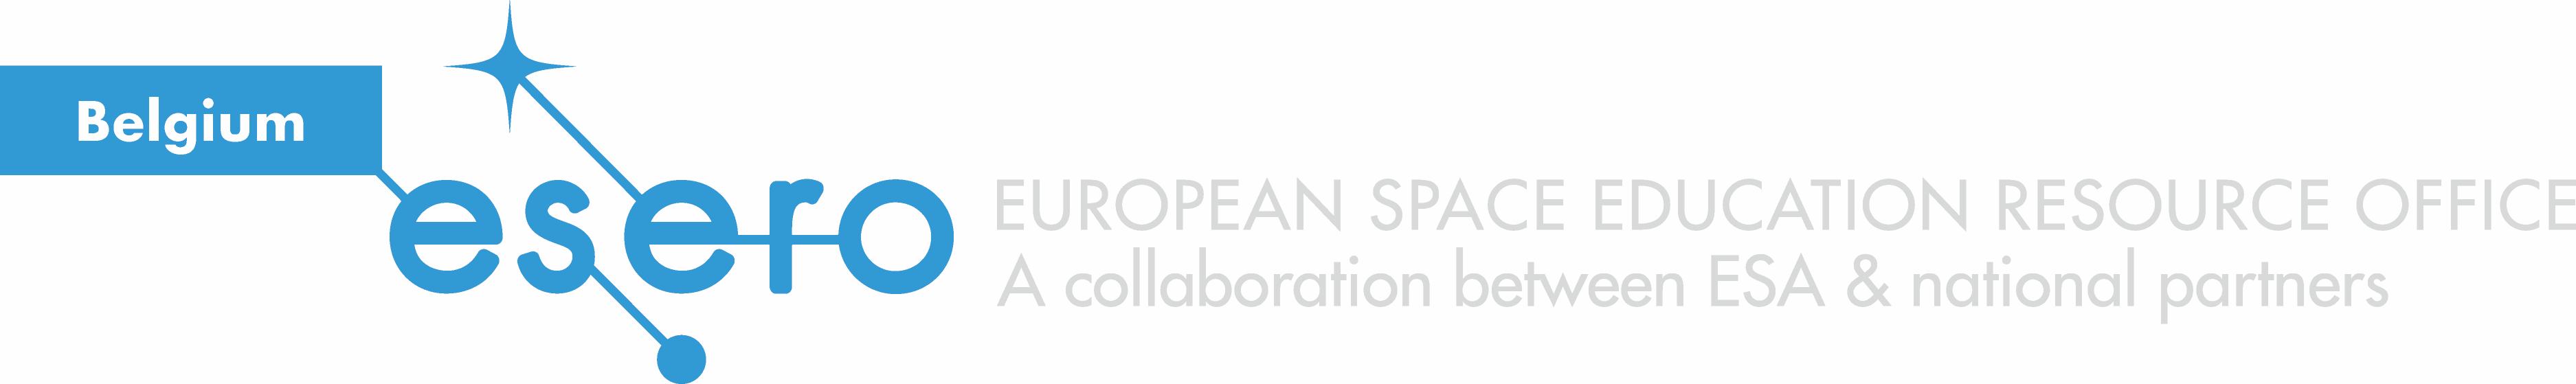 ESERO Belgique Logo